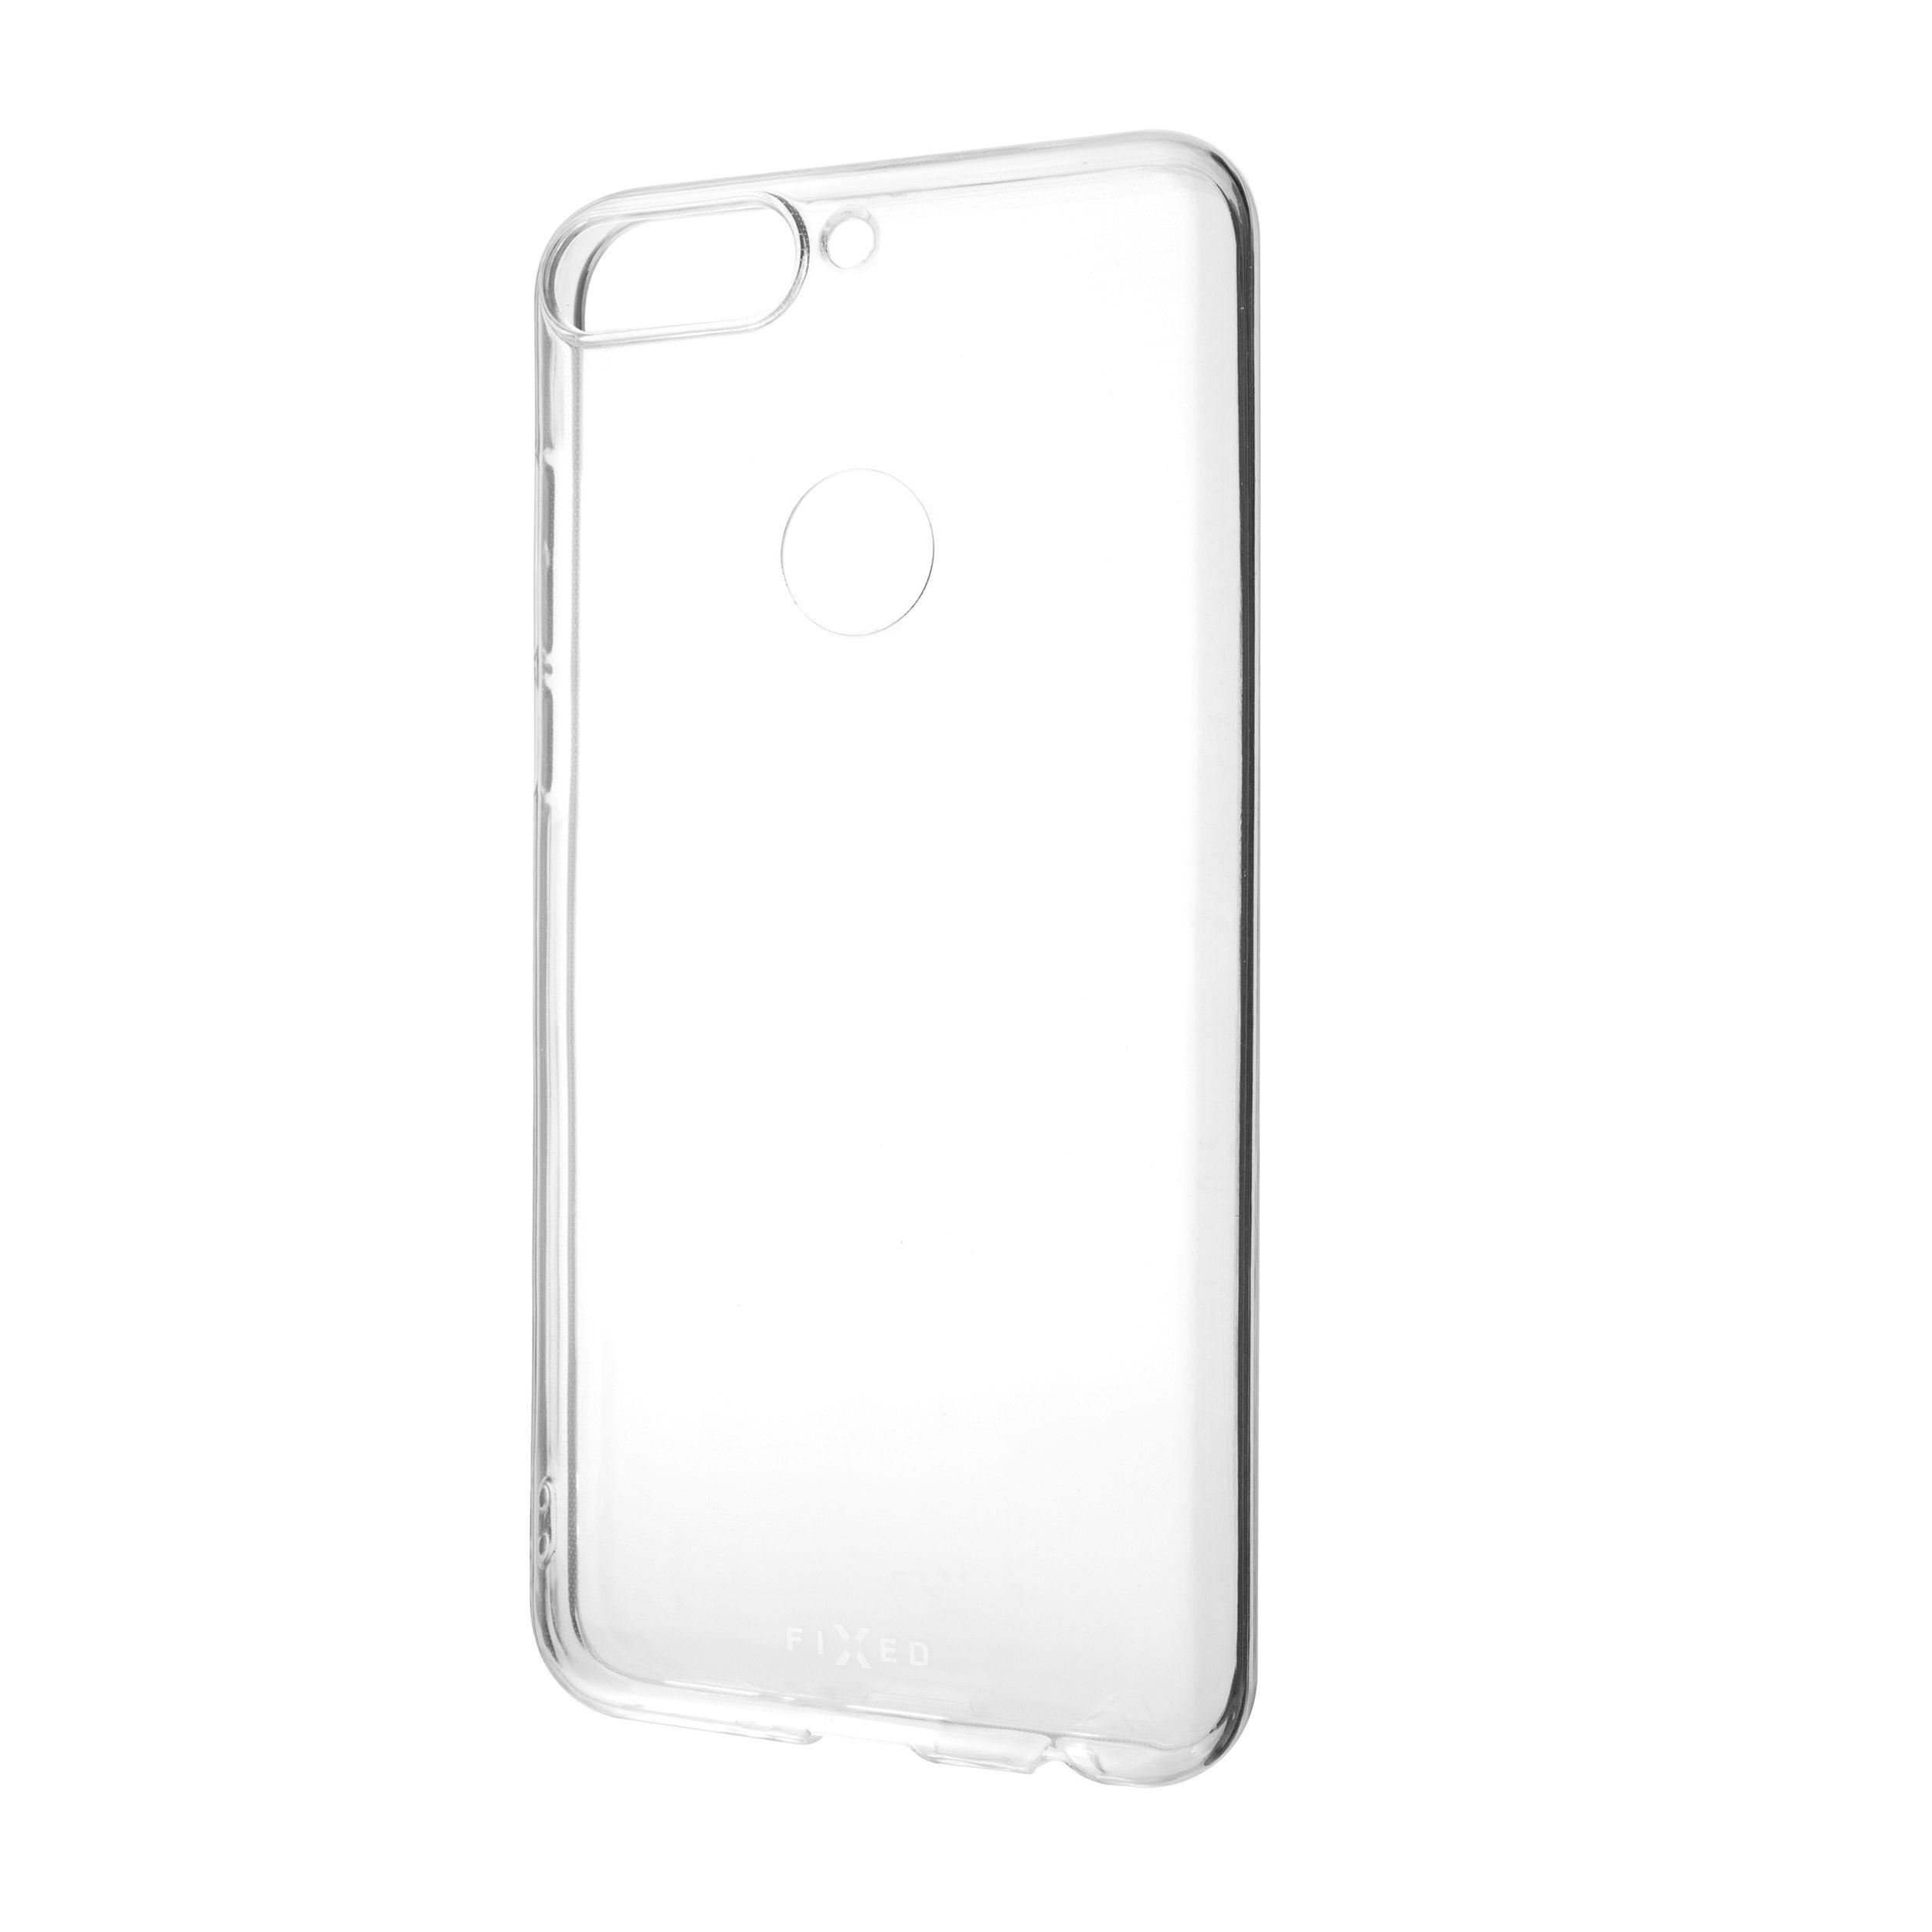 Ultratenké TPU gelové pouzdro FIXED Skin pro Huawei Y7 Prime (2018), 0,6 mm, čiré